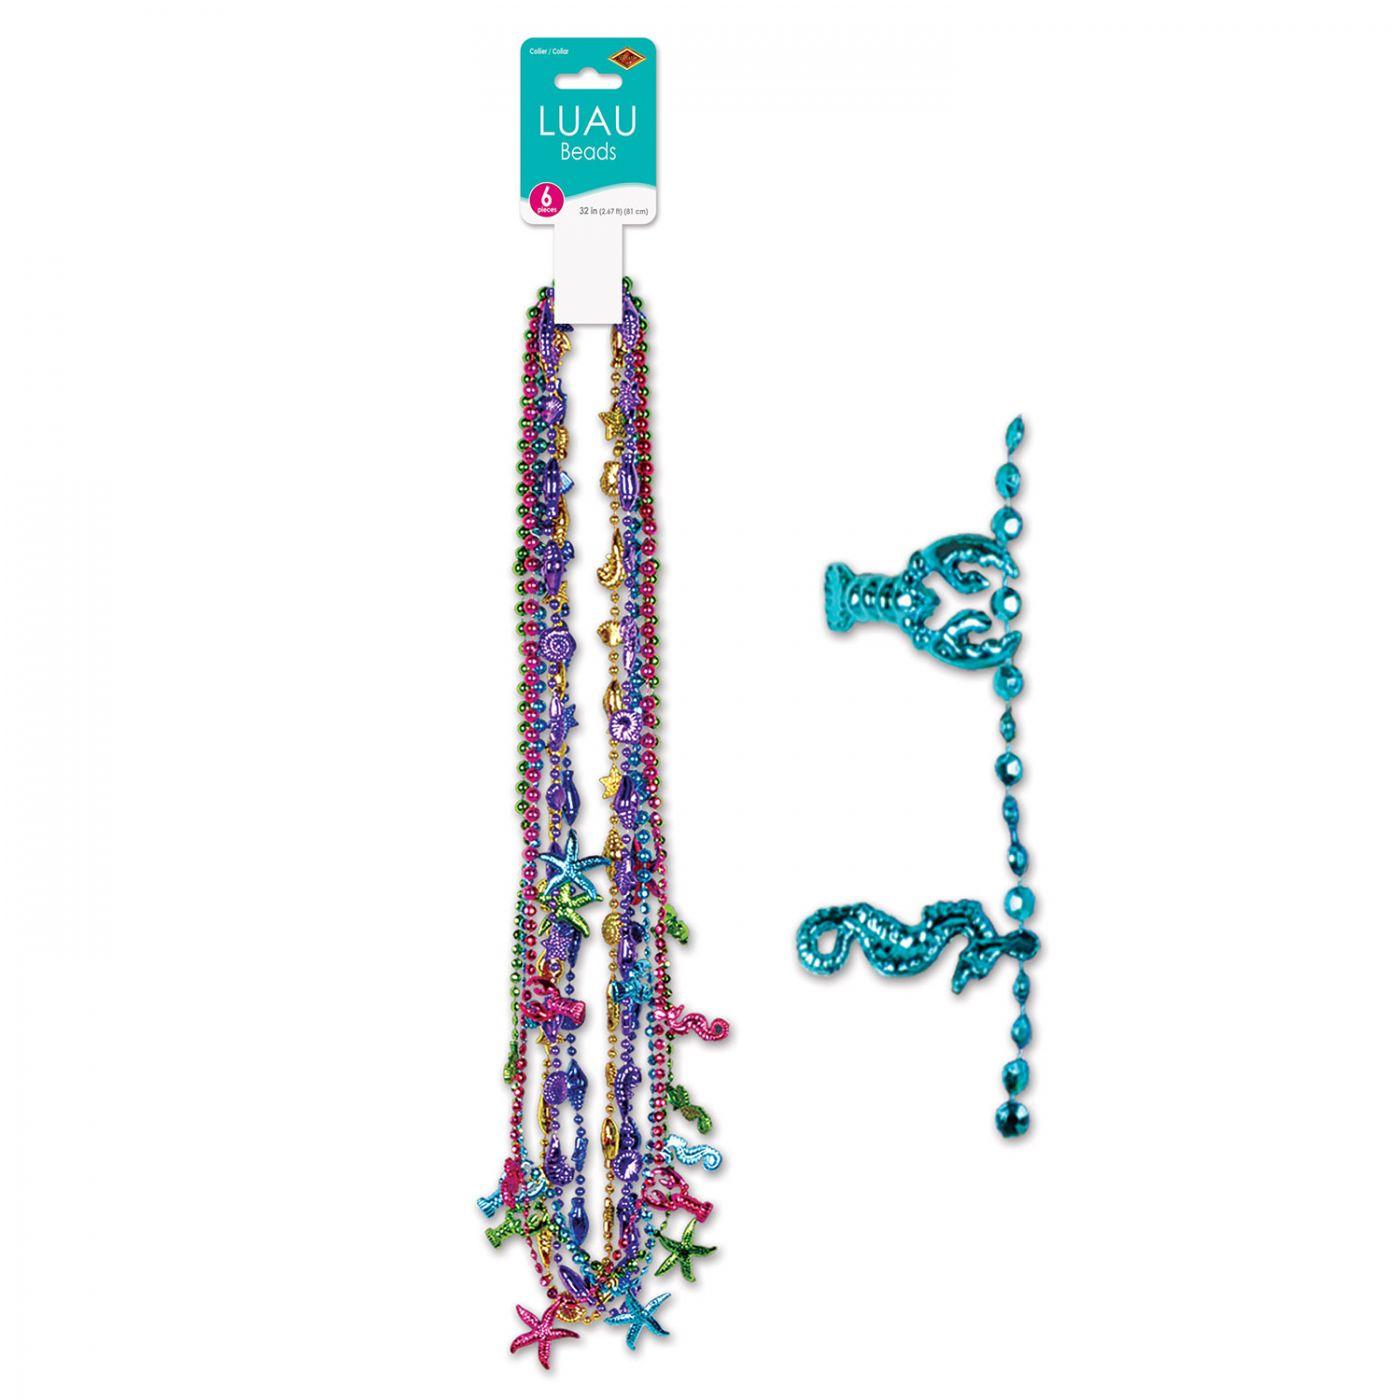 Luau Beads image